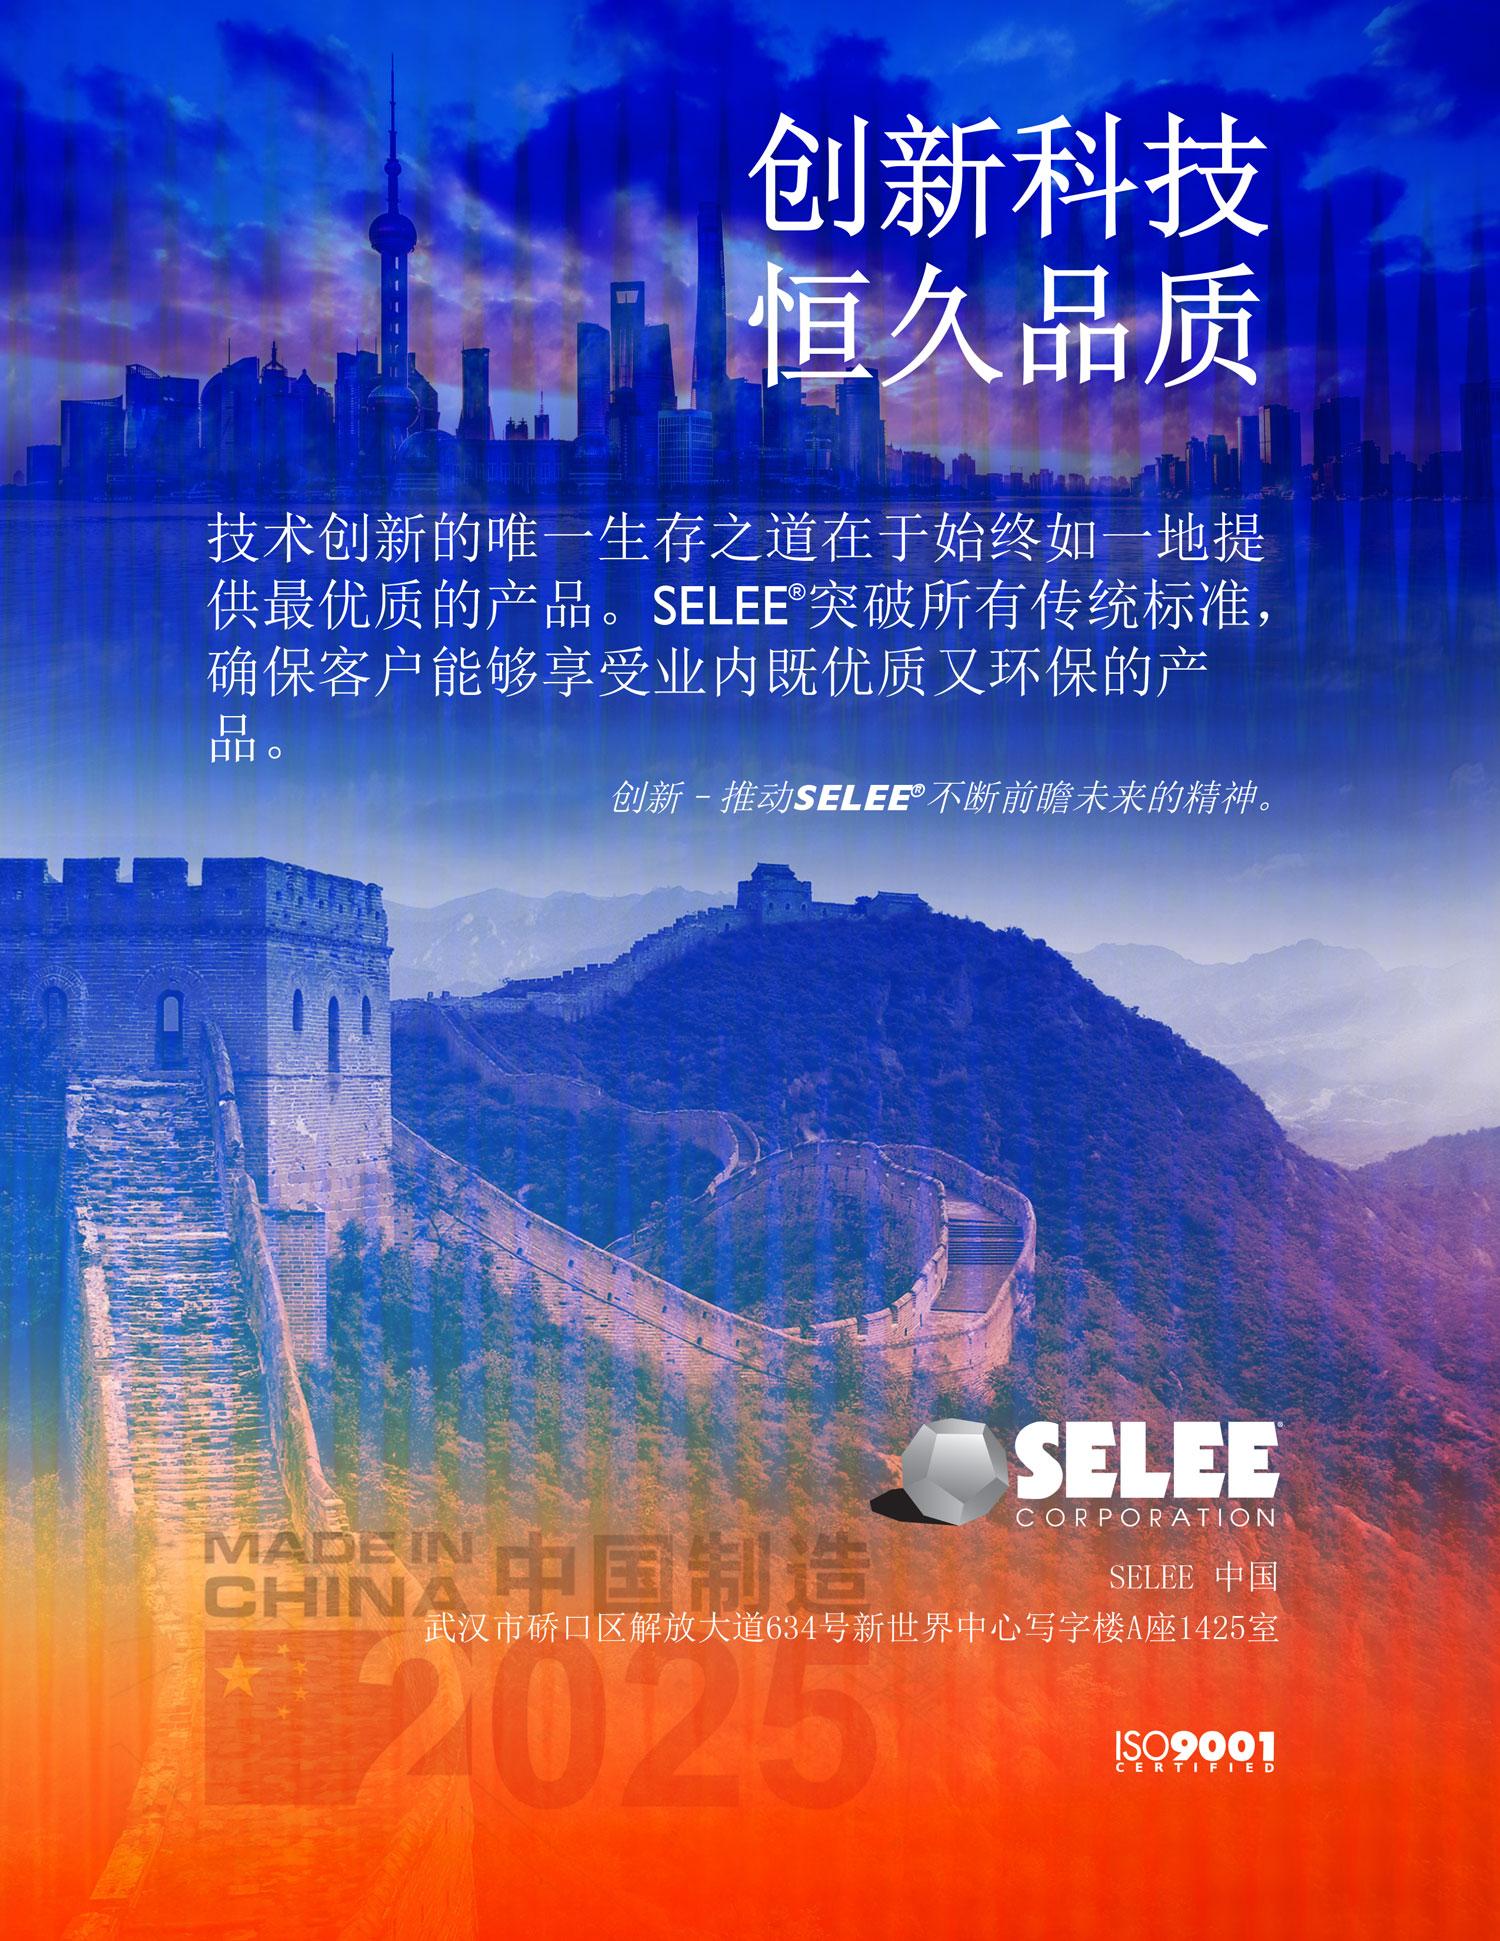 China-Ad_translated_2019-2a.jpg